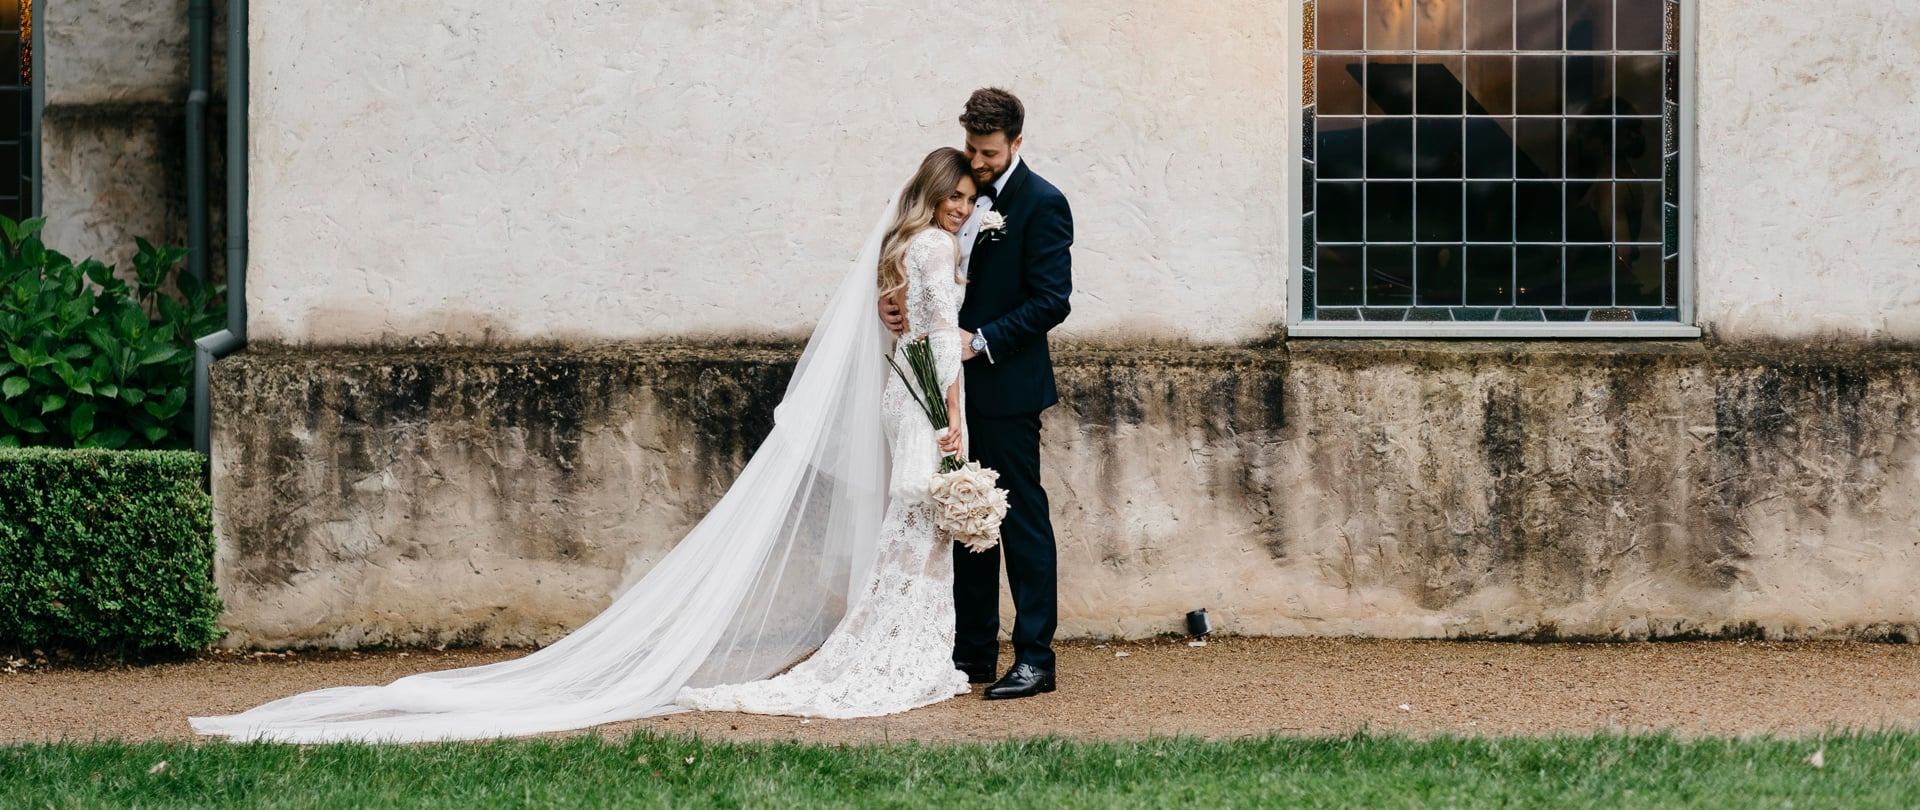 Nicola & Stephen Wedding Video Filmed at Yarra Valley, Victoria